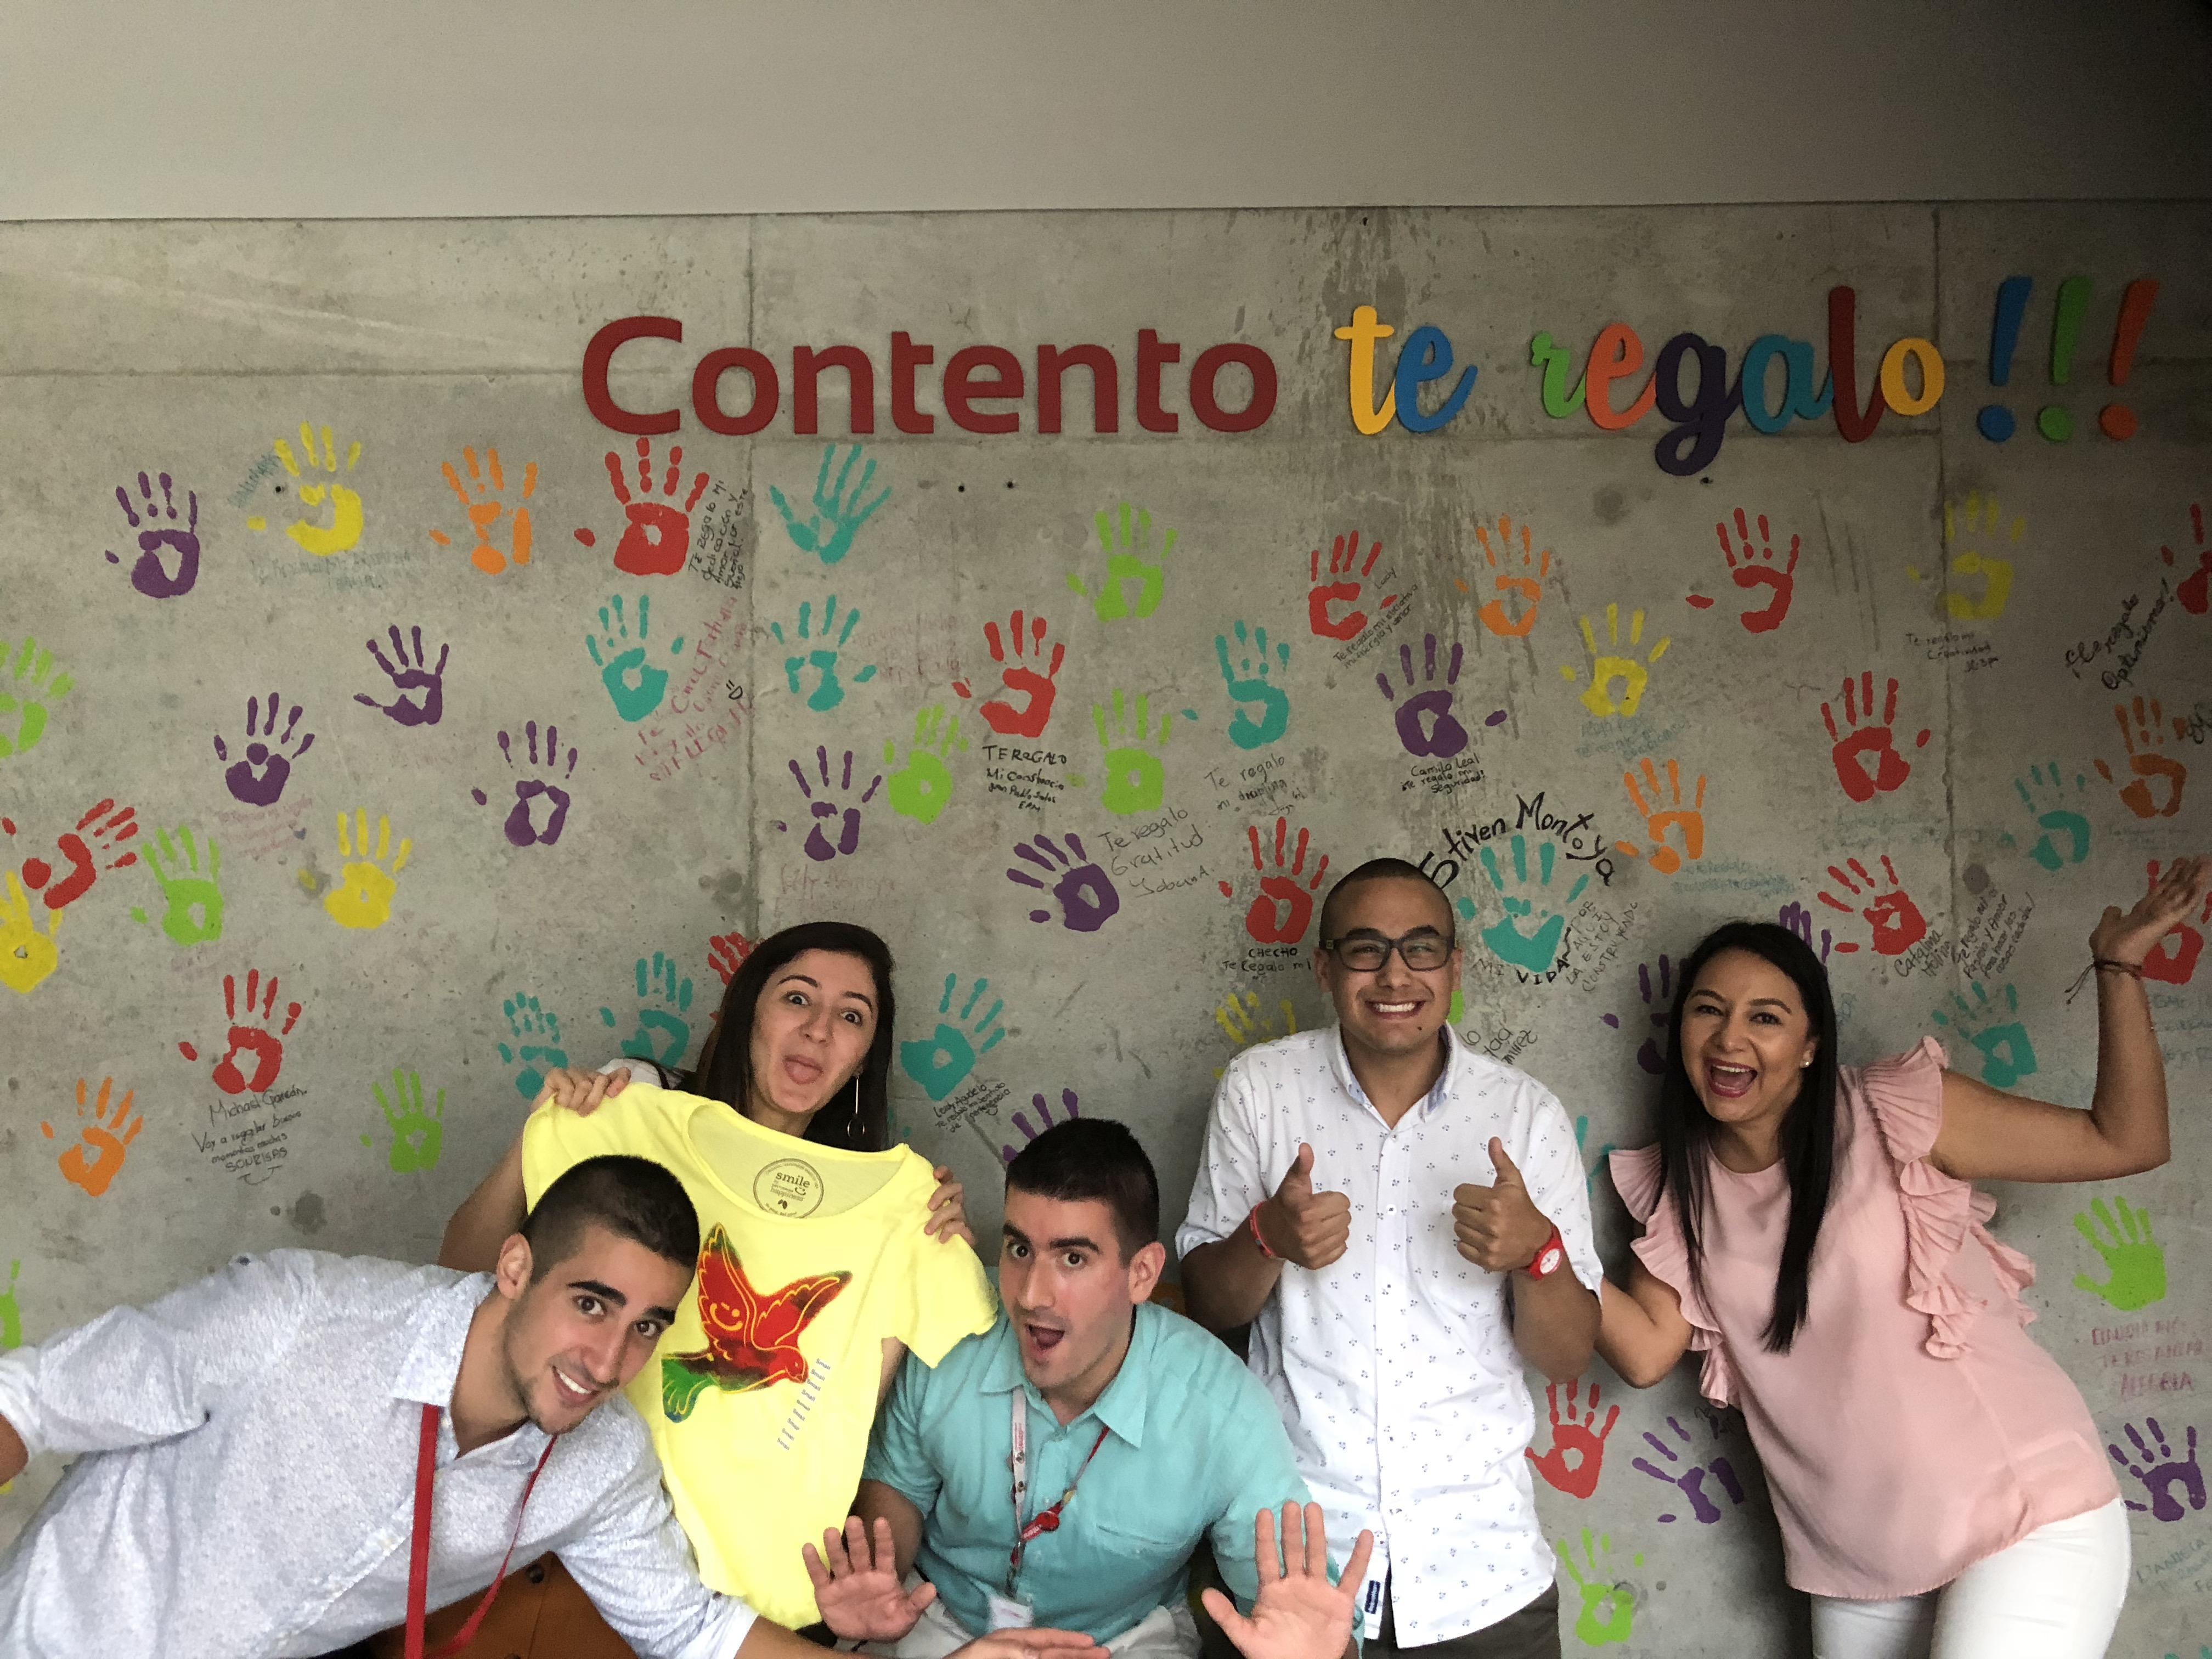 Contento Leadership Executives Colombia Culture